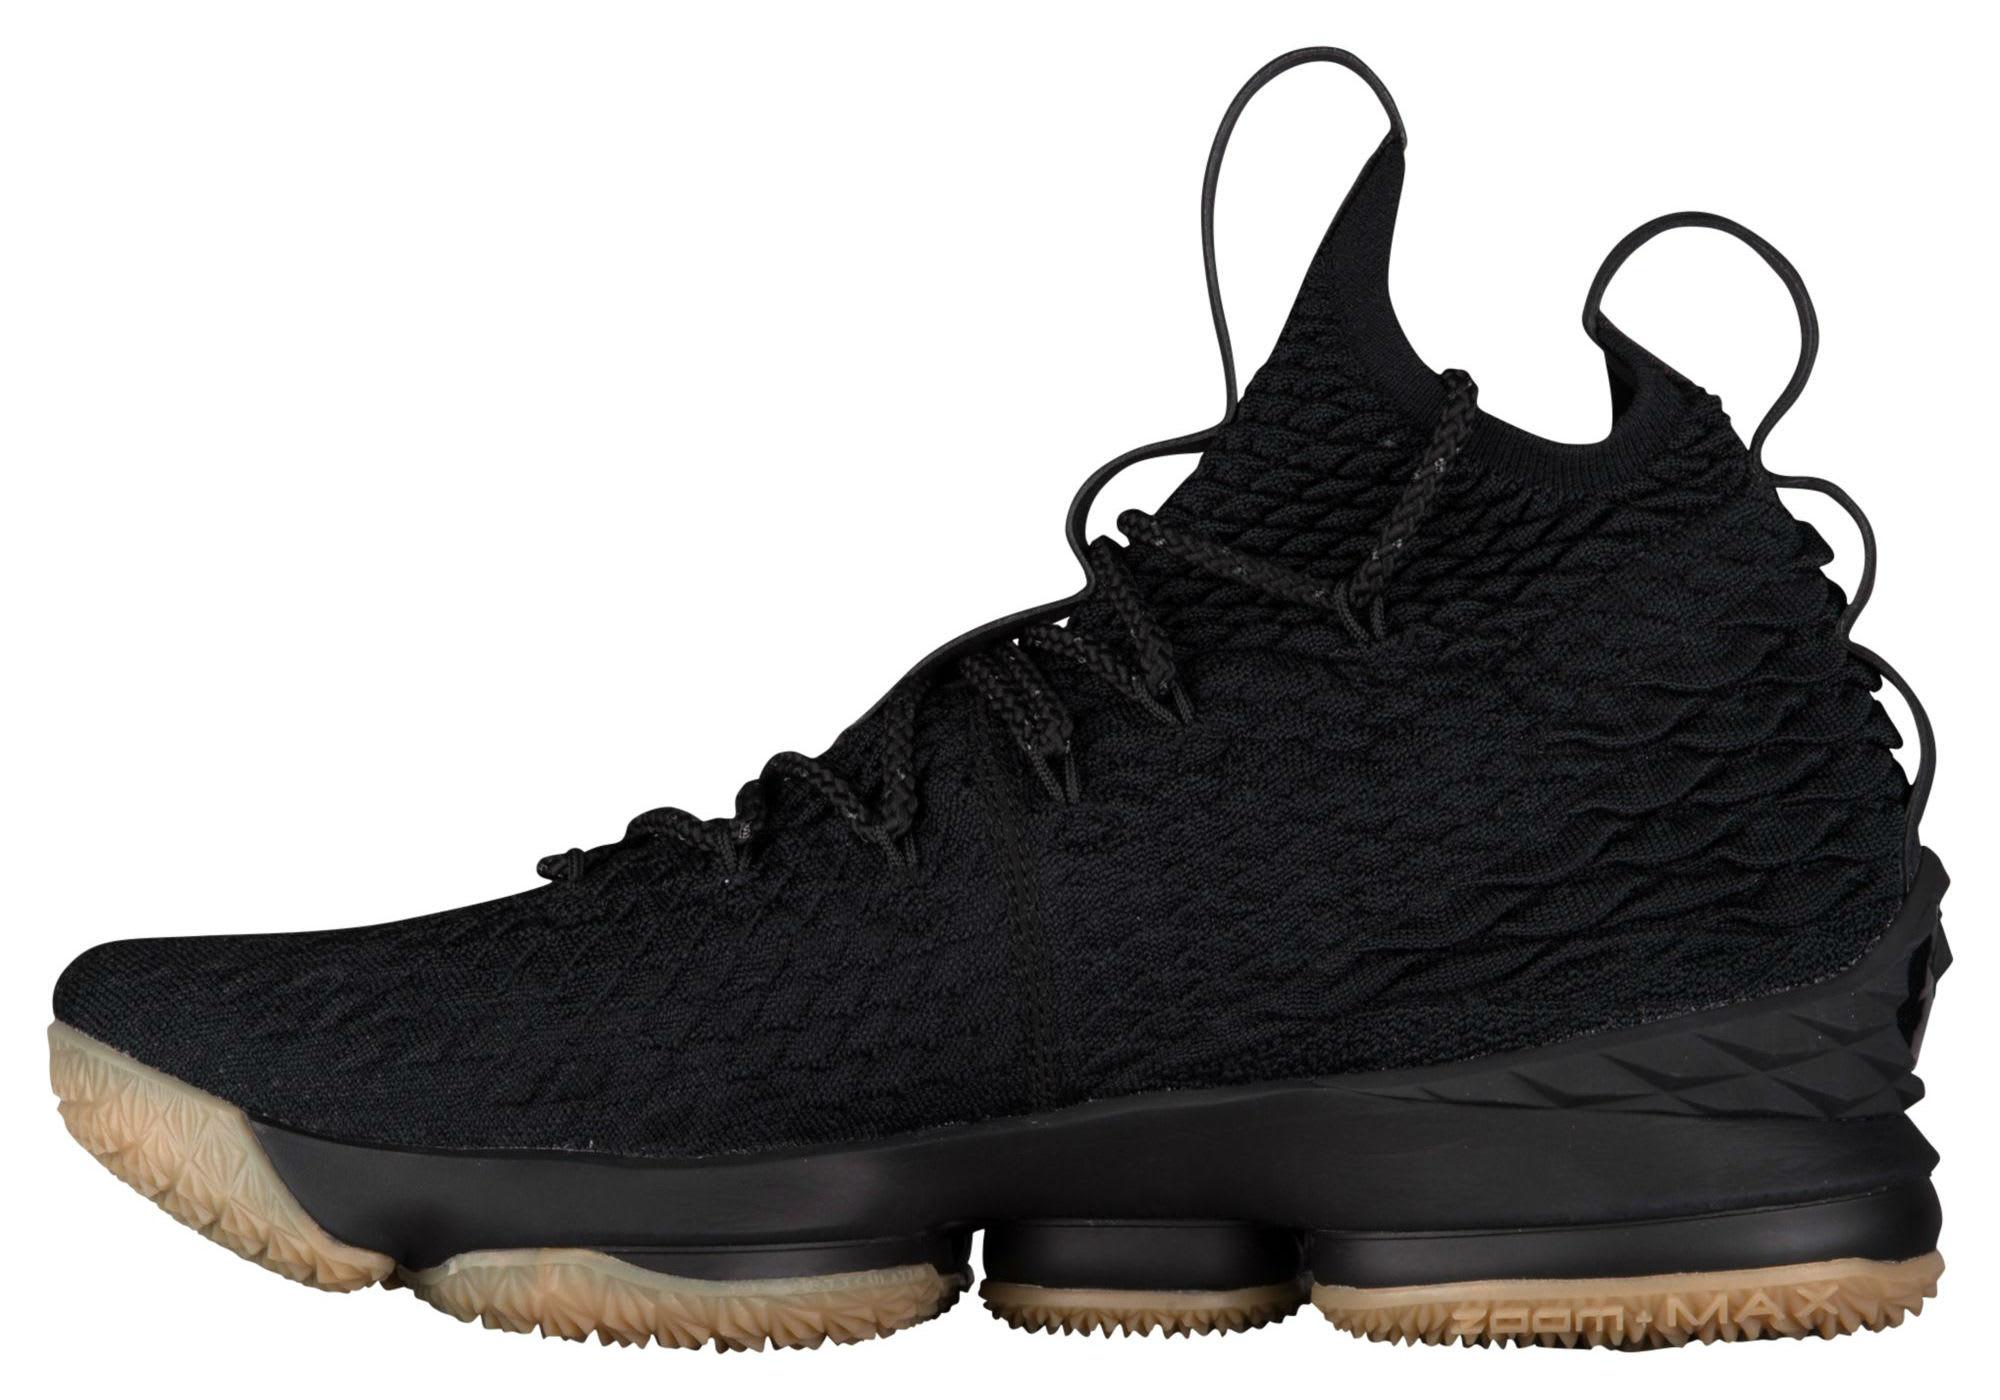 Nike Basketball Shoes  Release